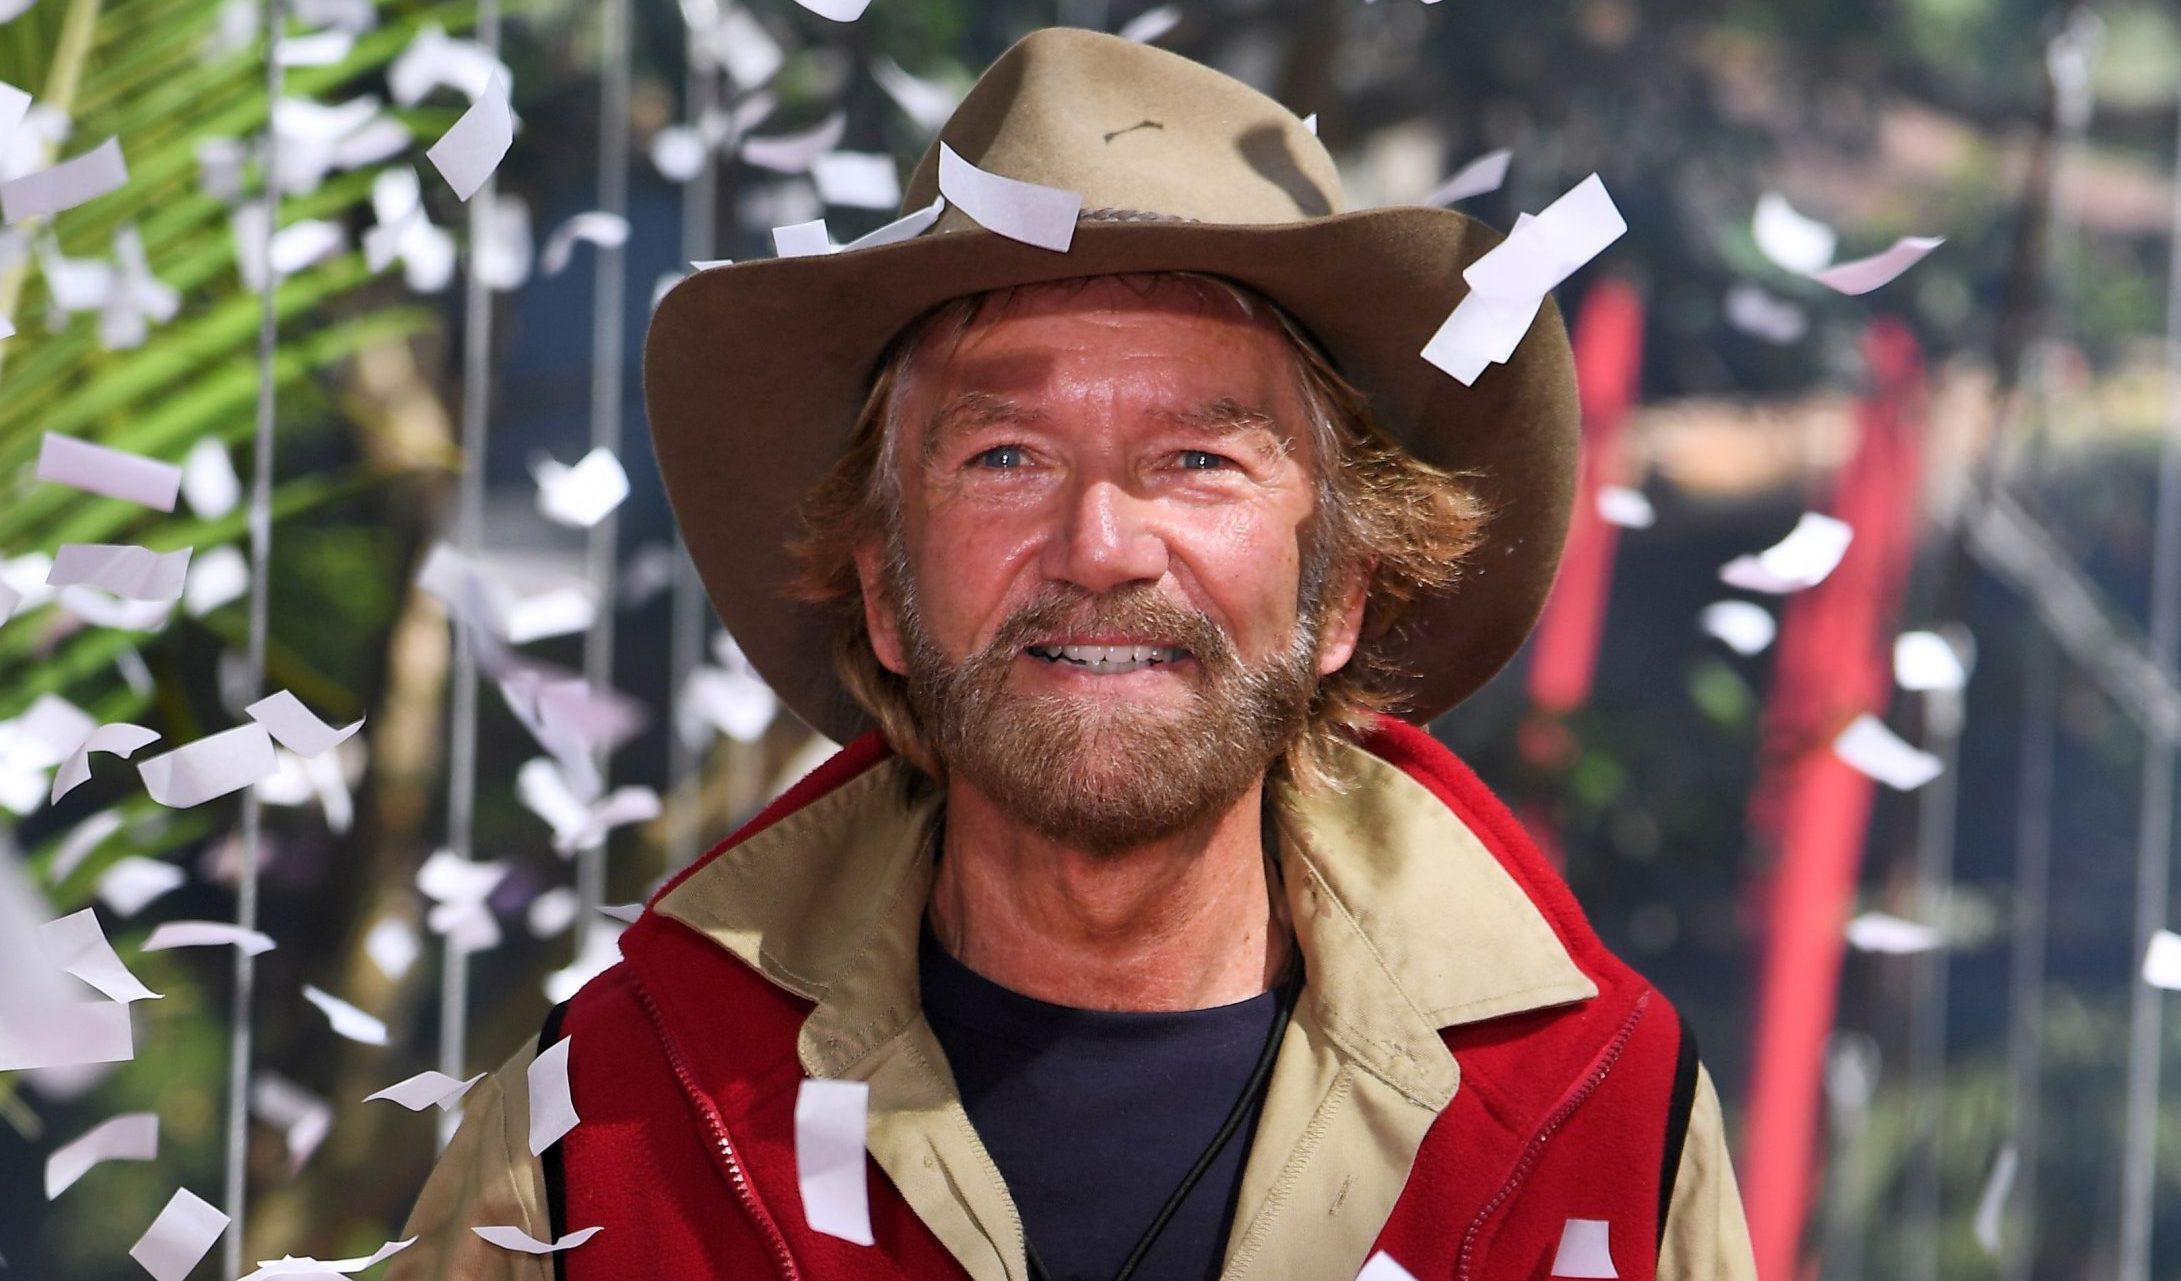 Mandatory Credit: Photo by James Gourley/REX (10010462af) Noel Edmonds is evicted 'I'm a Celebrity... Get Me Out of Here!' TV Show, Series 18, Australia - 30 Nov 2018